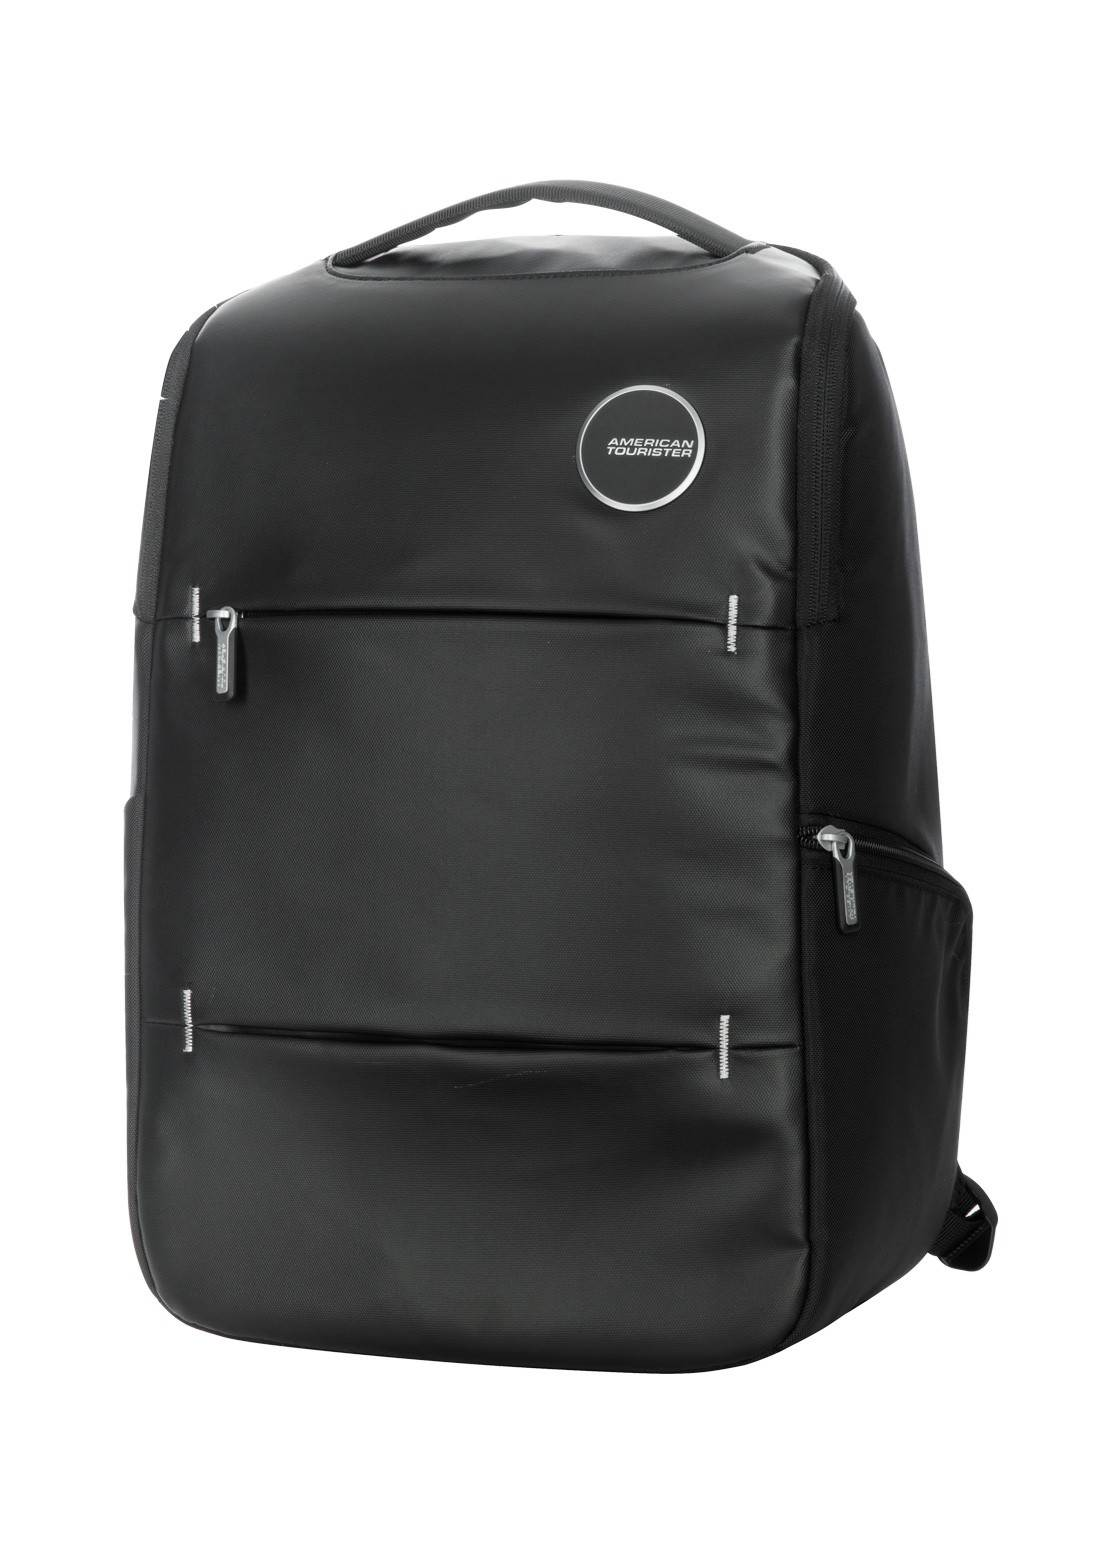 2X Korjo Travel Bags Backpack Day Back Pack Rucksack+Money Belt Bum Bag Pouch AU